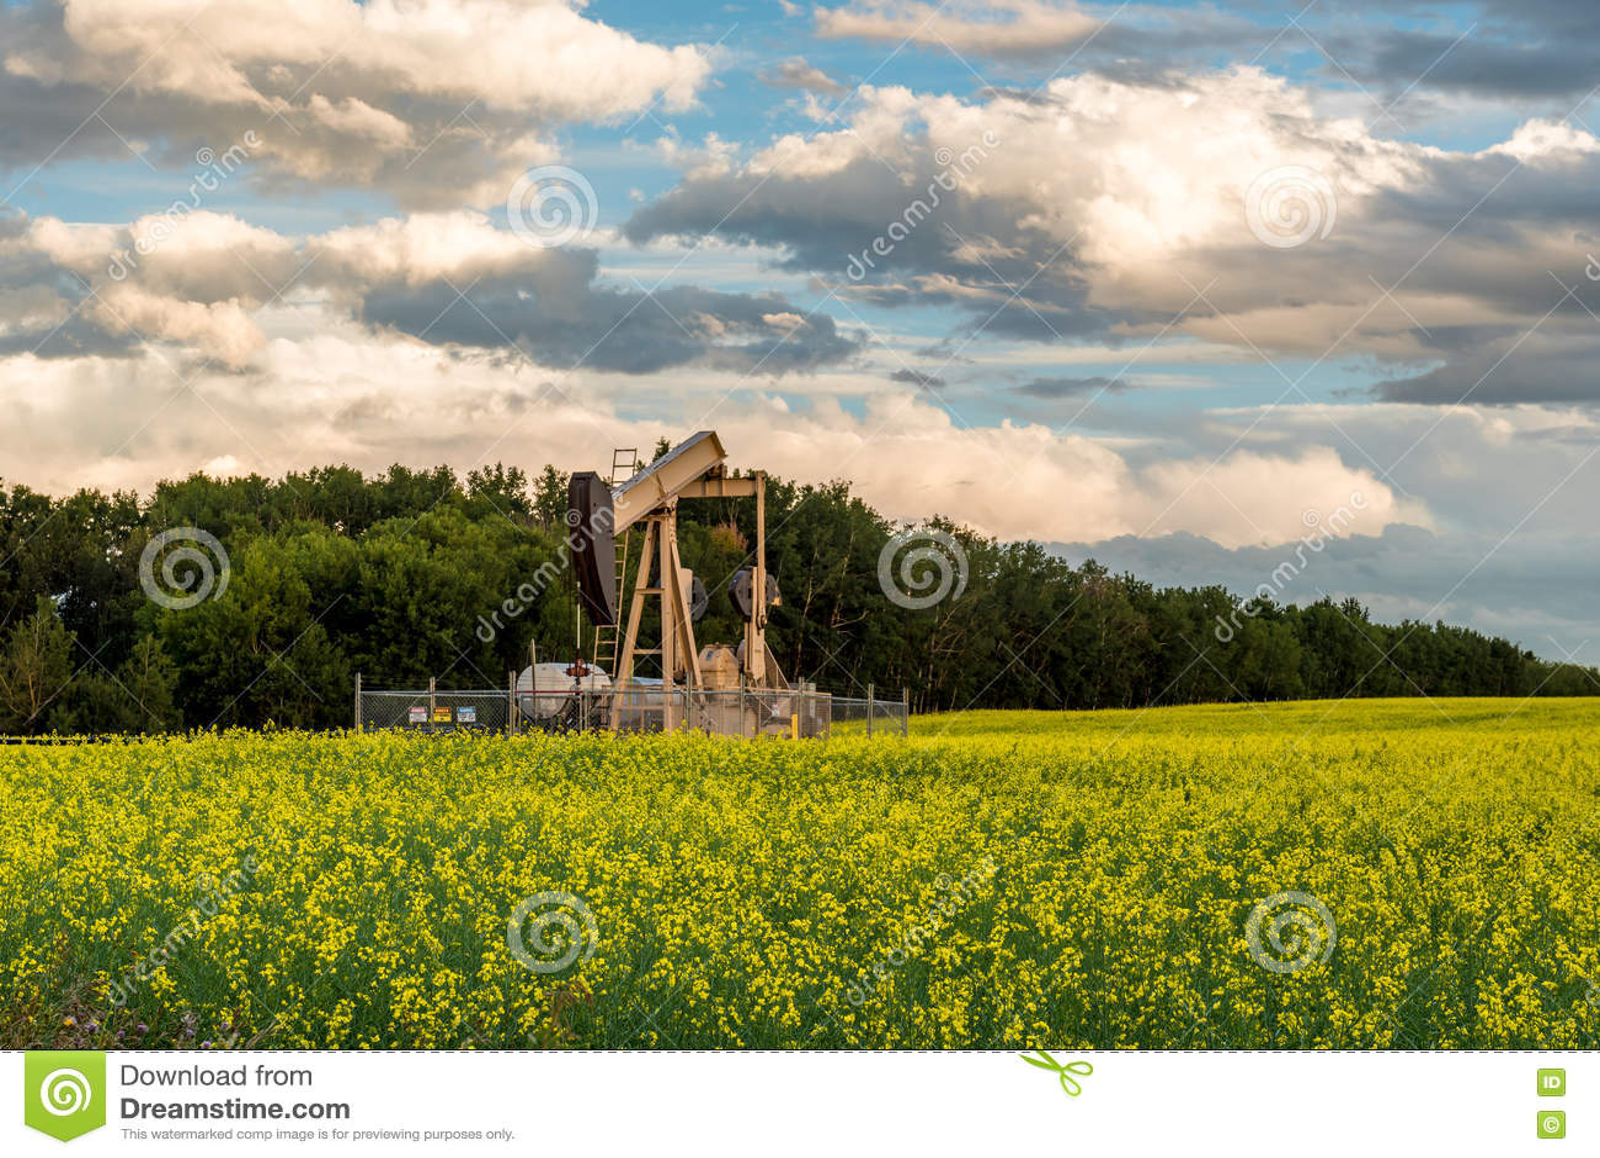 Oil well pump jack